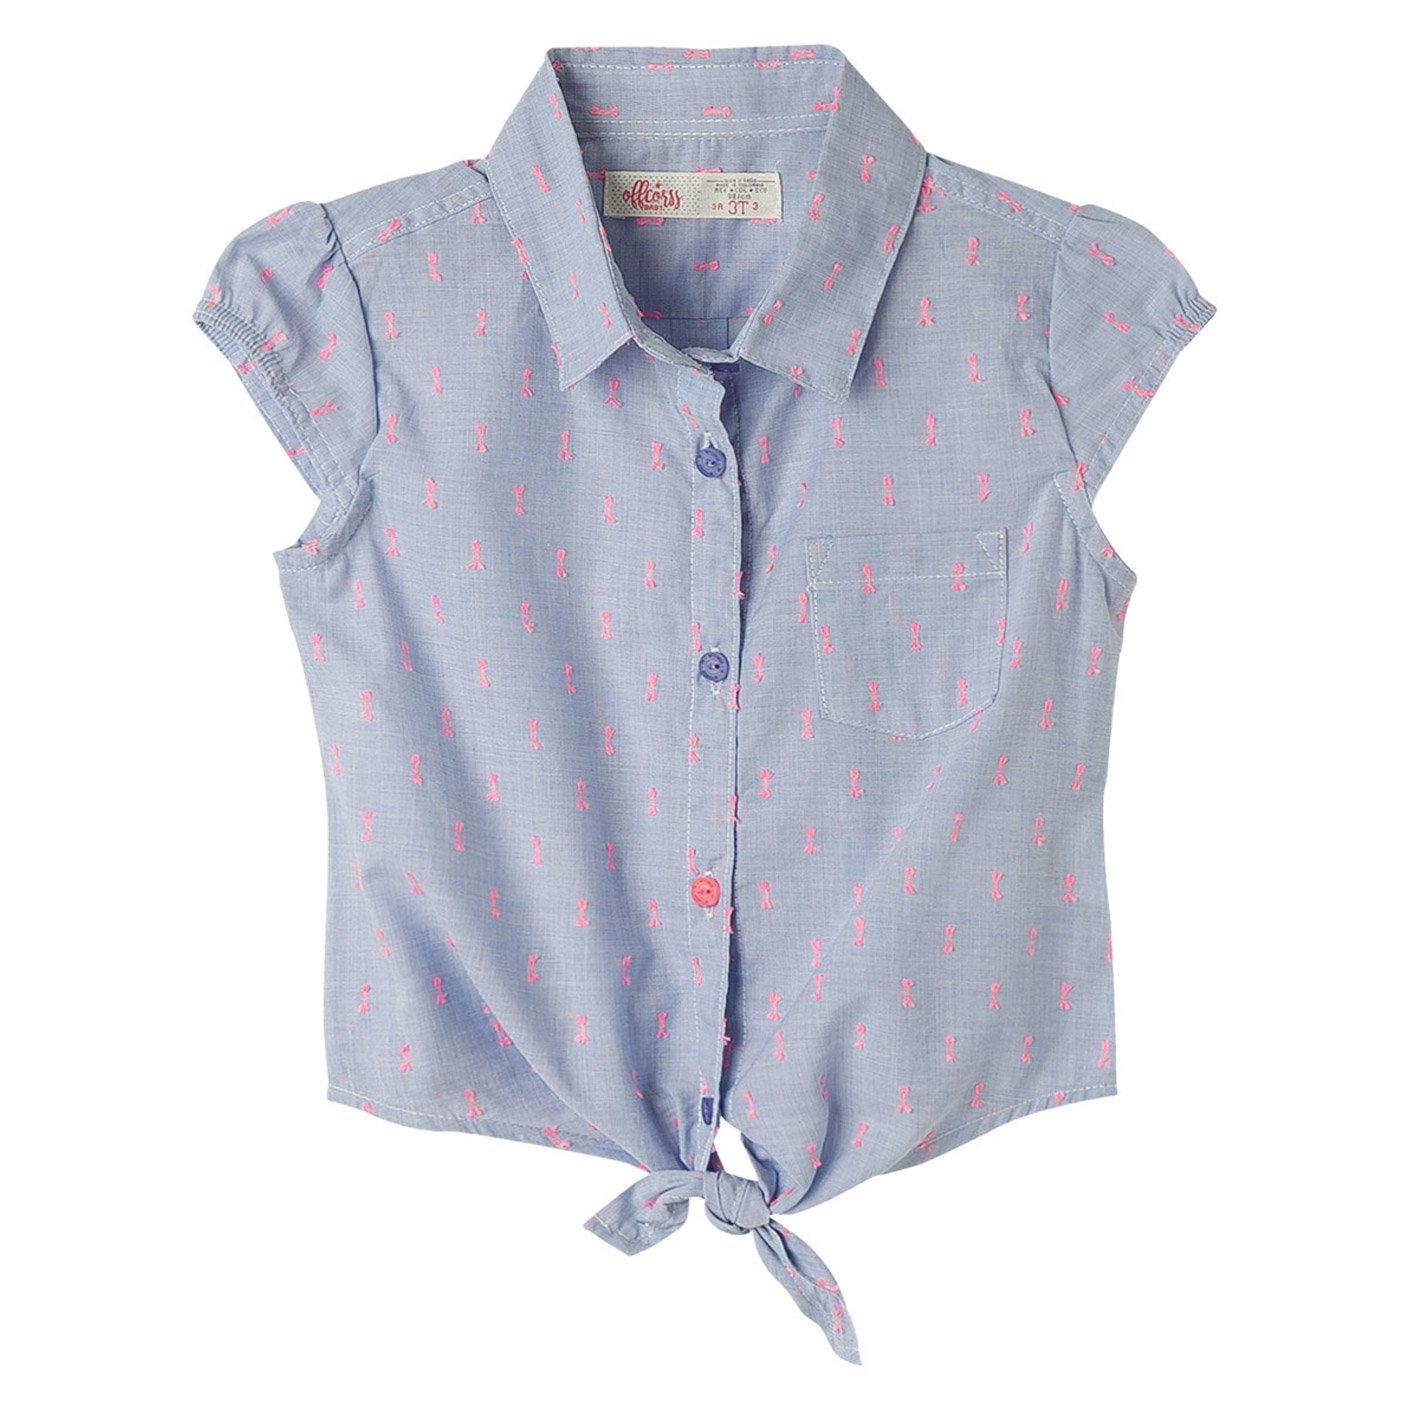 Amazon Offcorss Toddler Girls Sleeveless Collared Shirt Blouse